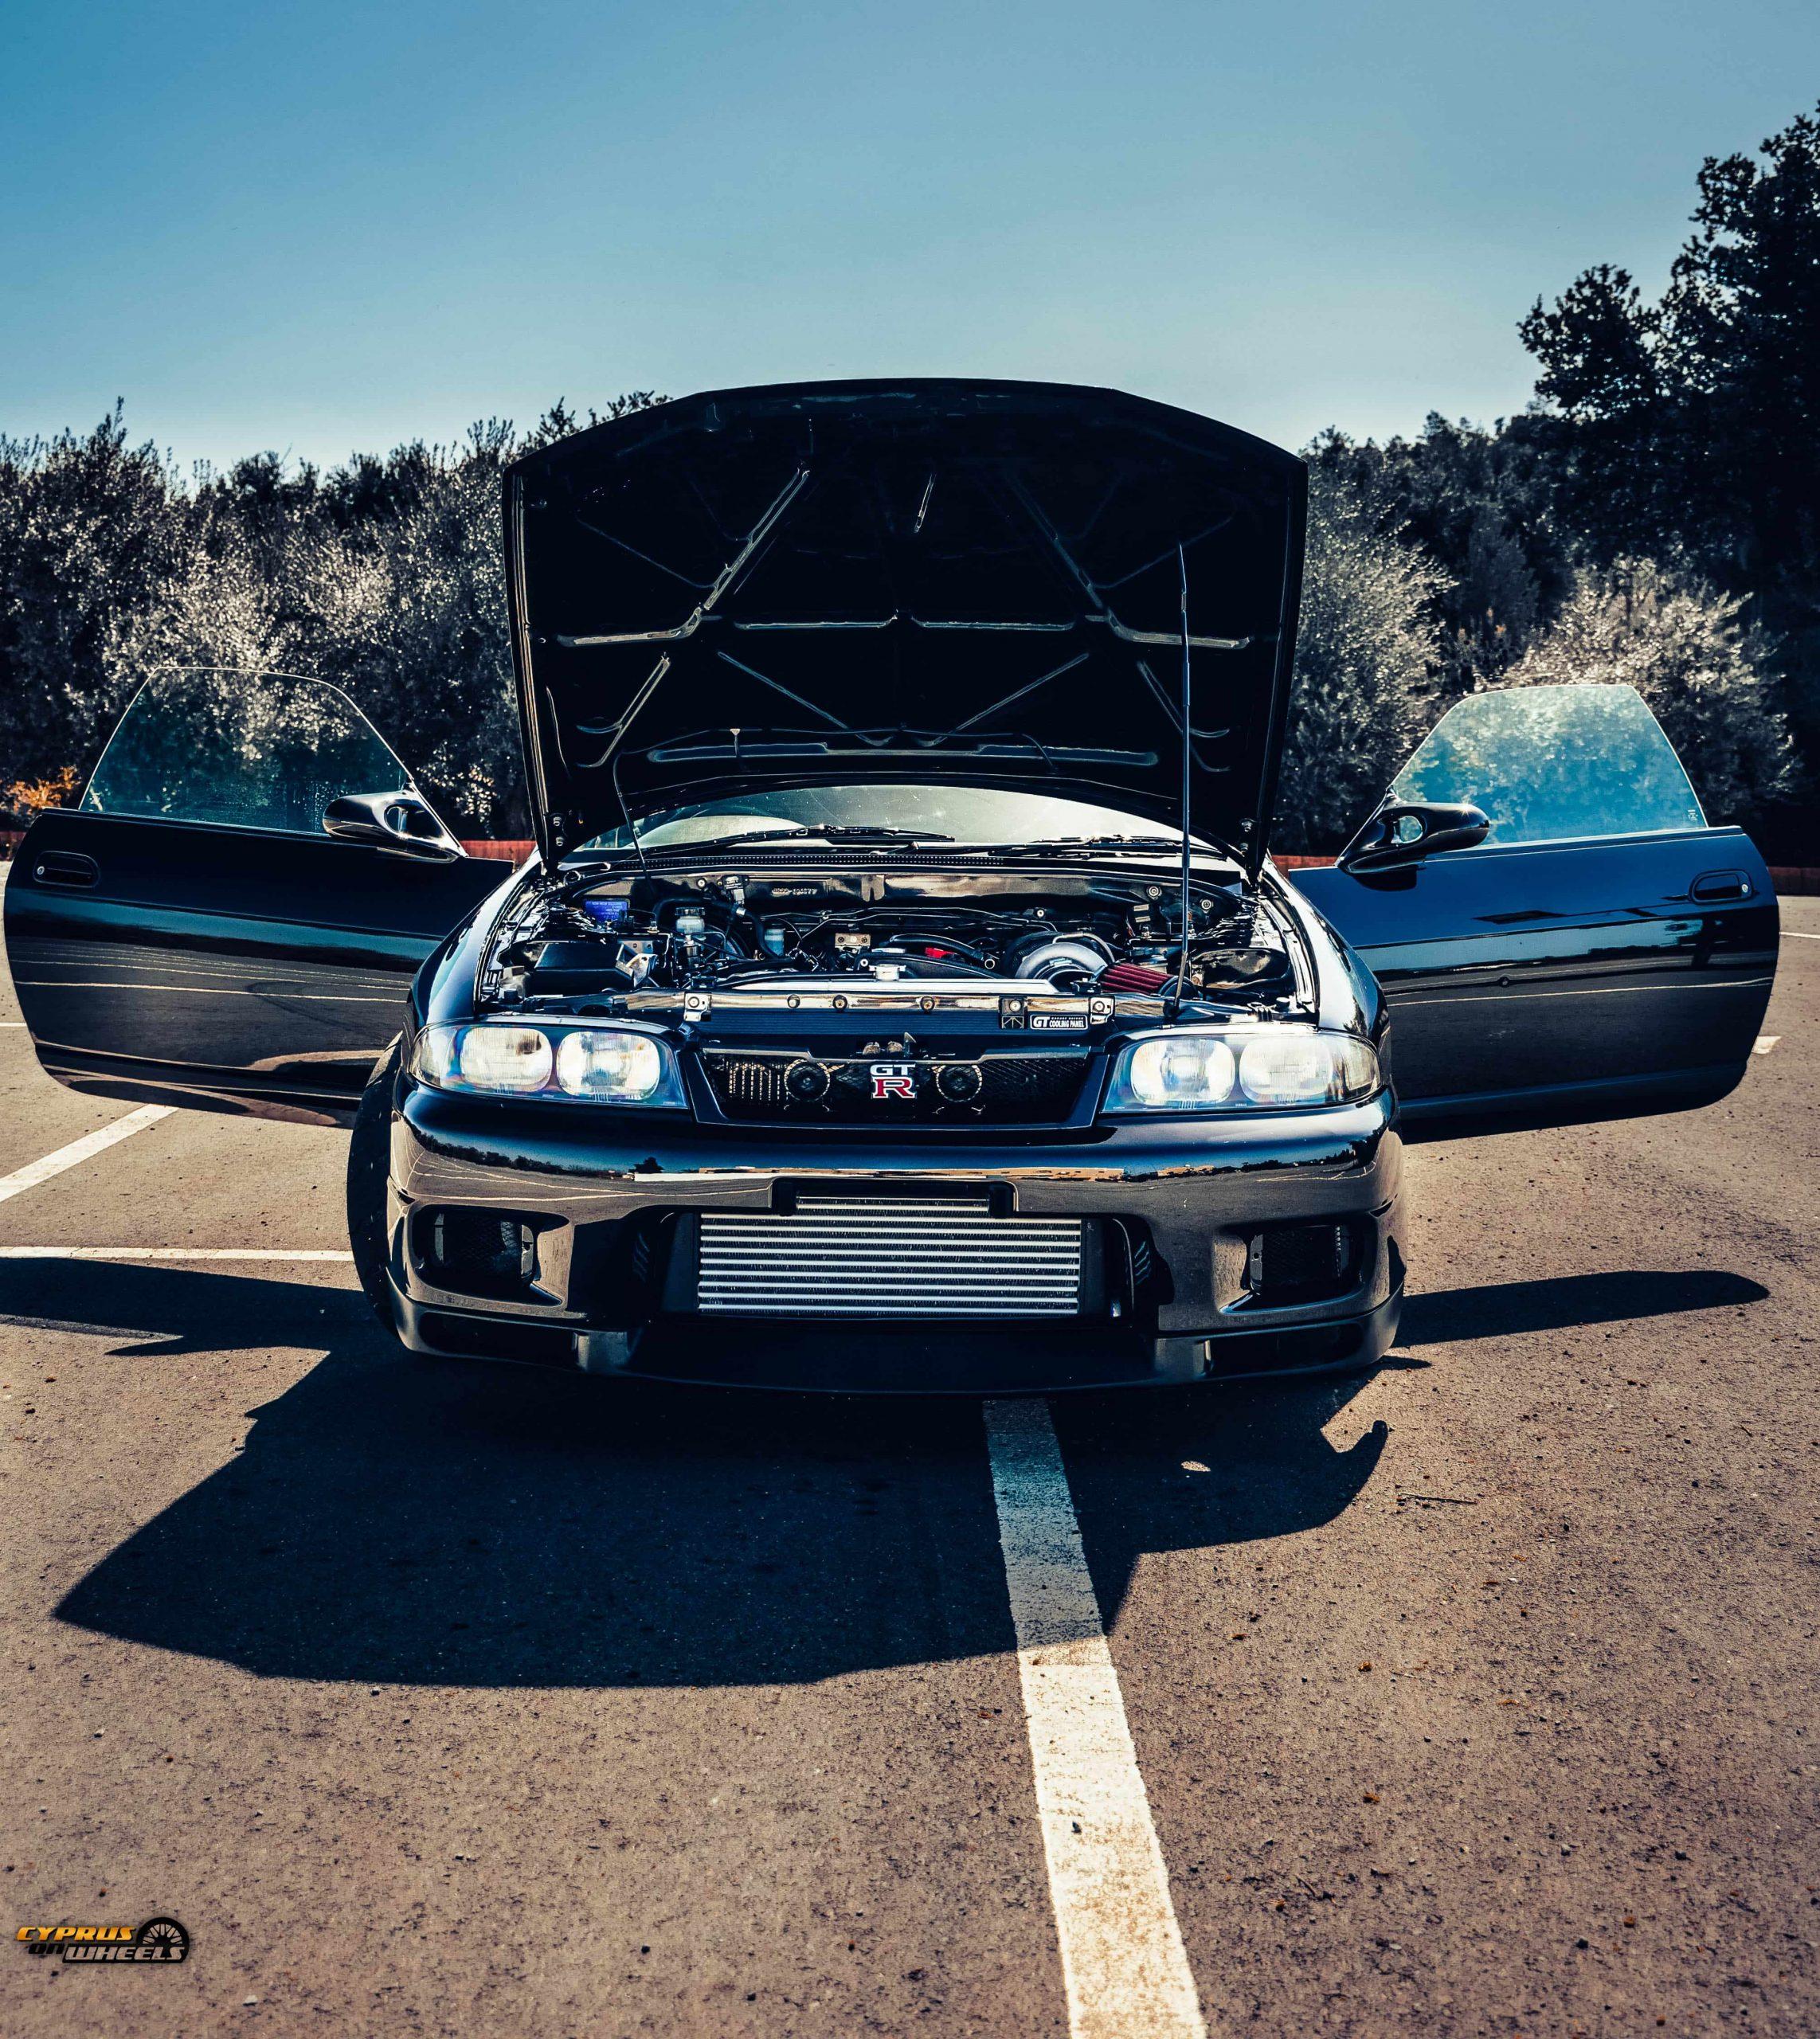 Nissan skyline R33 gtst RB25DET